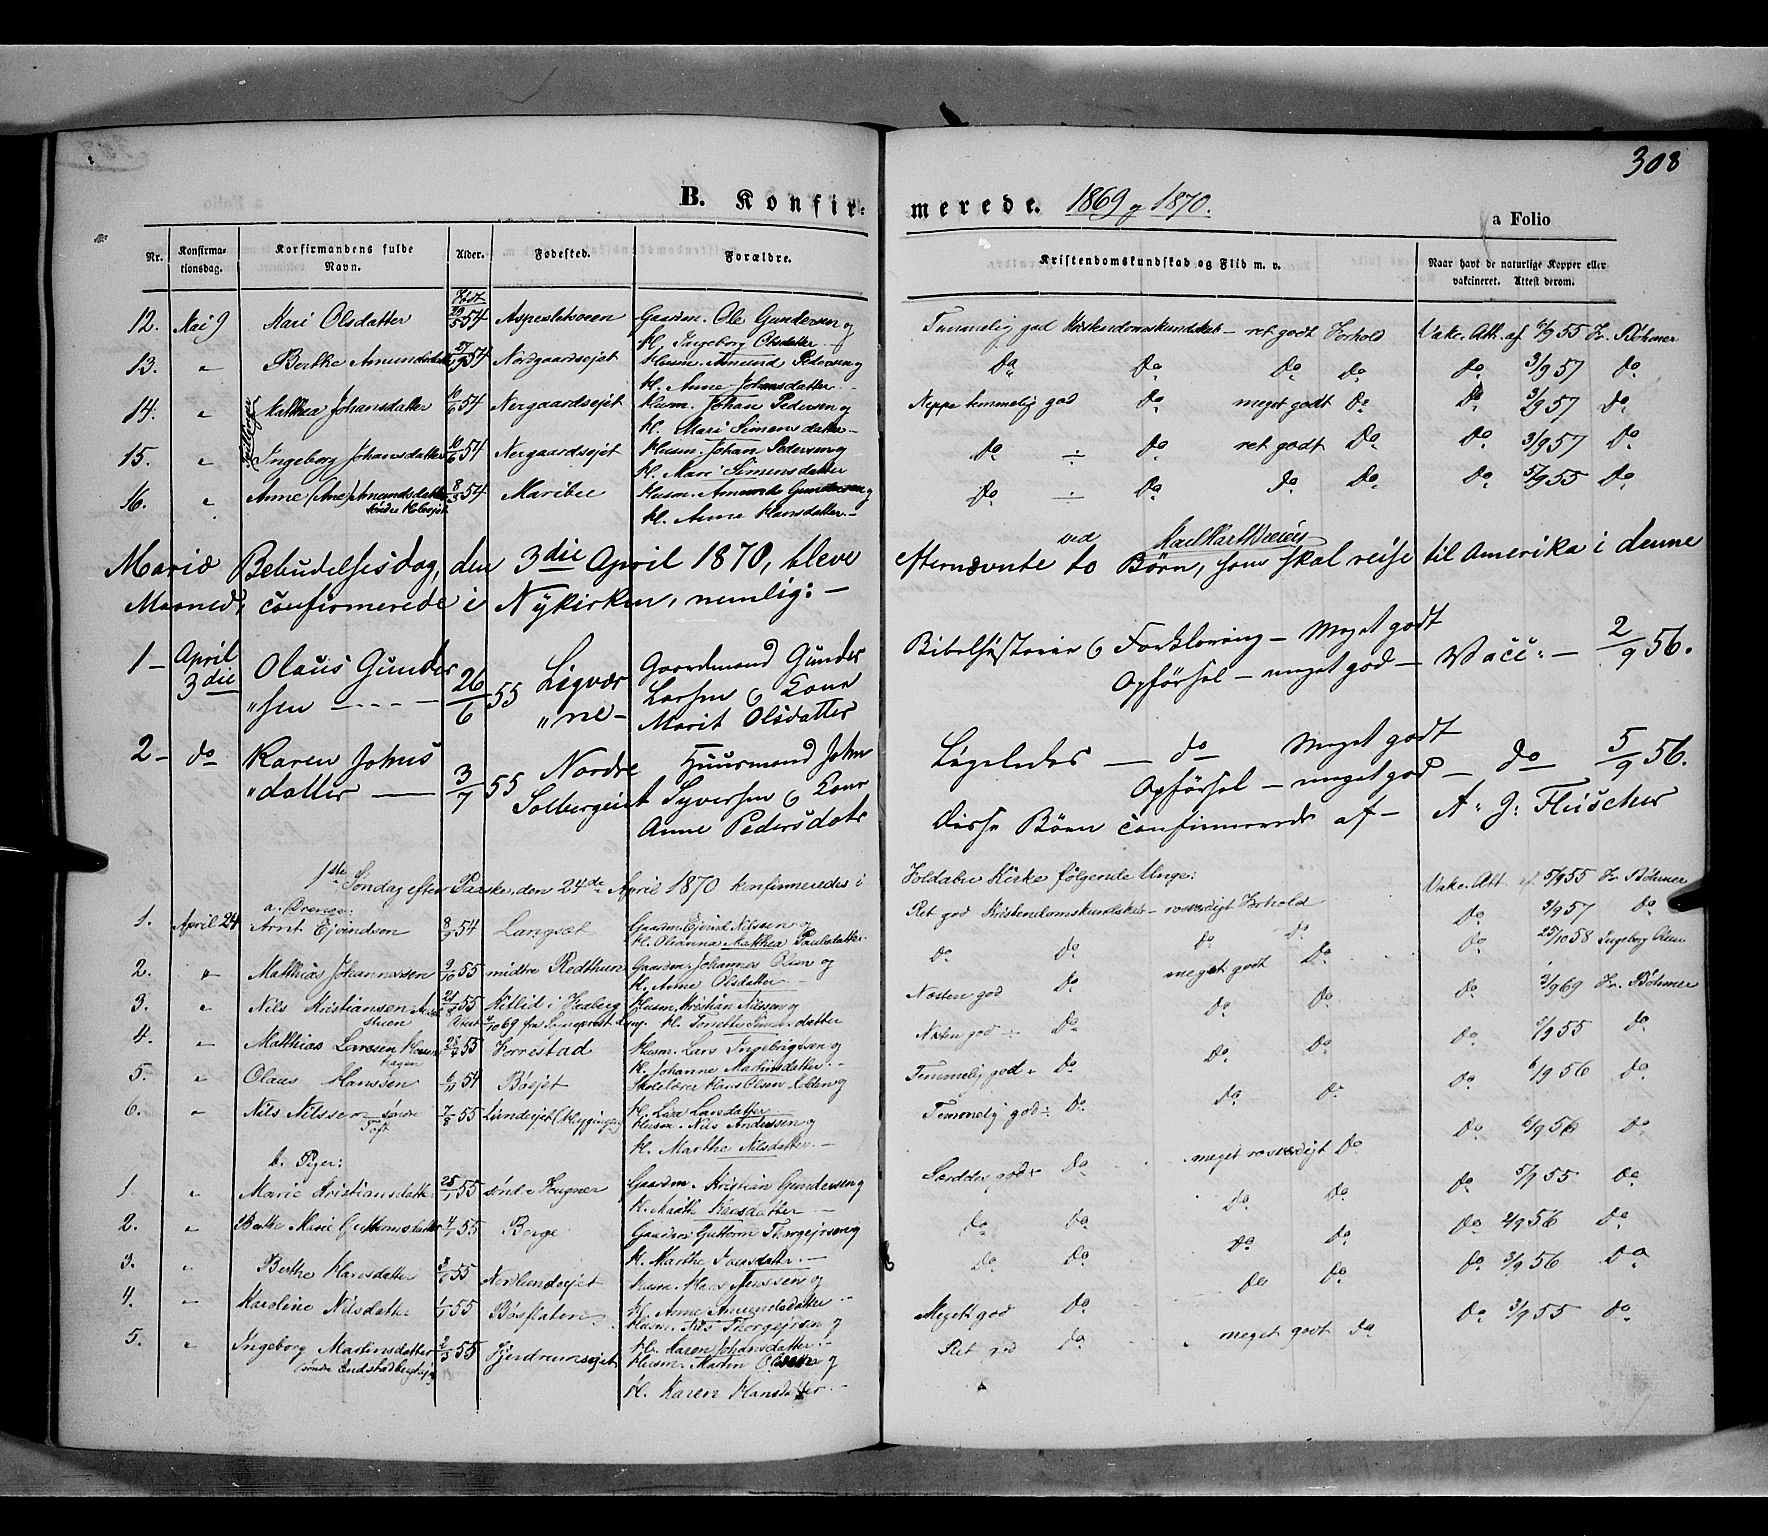 SAH, Gausdal prestekontor, Ministerialbok nr. 9, 1862-1873, s. 308